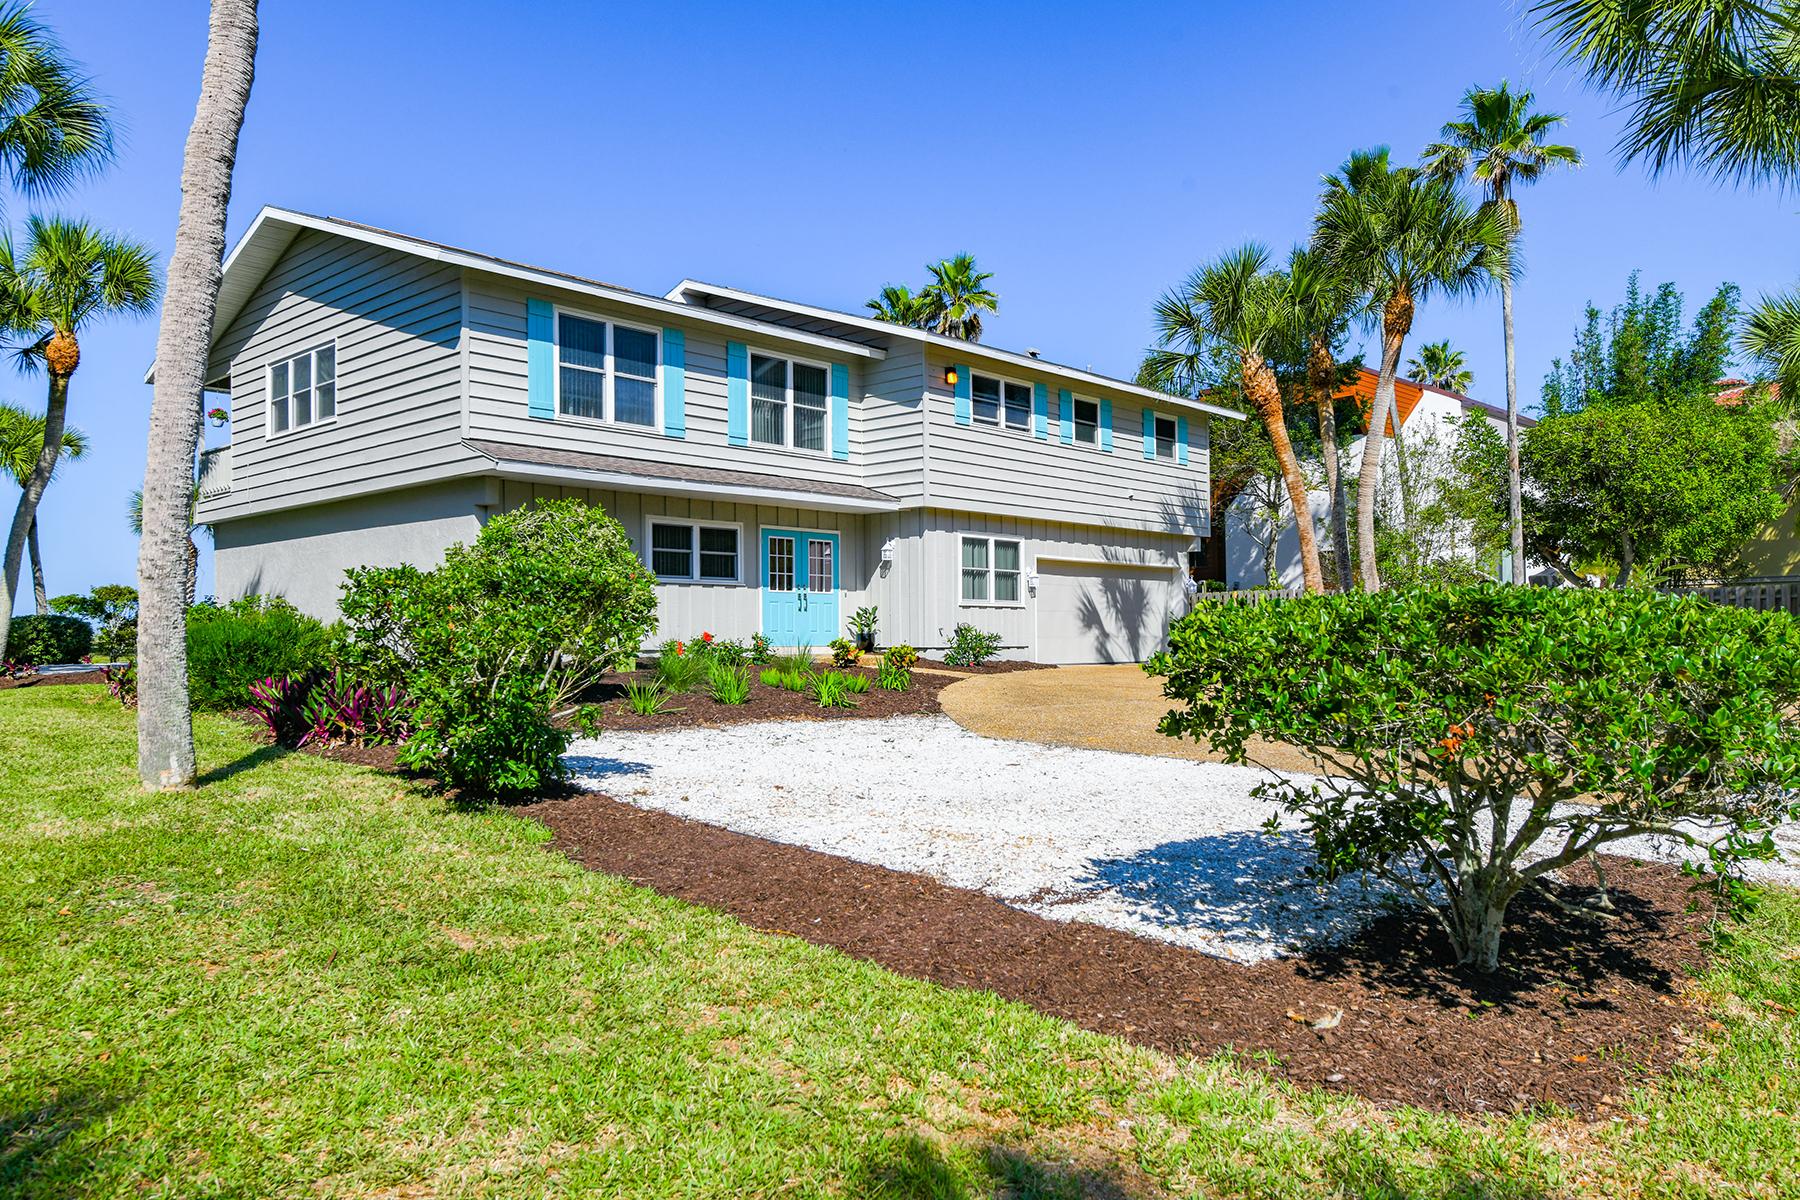 Single Family Homes for Active at 513 Casey Key Rd Nokomis, Florida 34275 United States